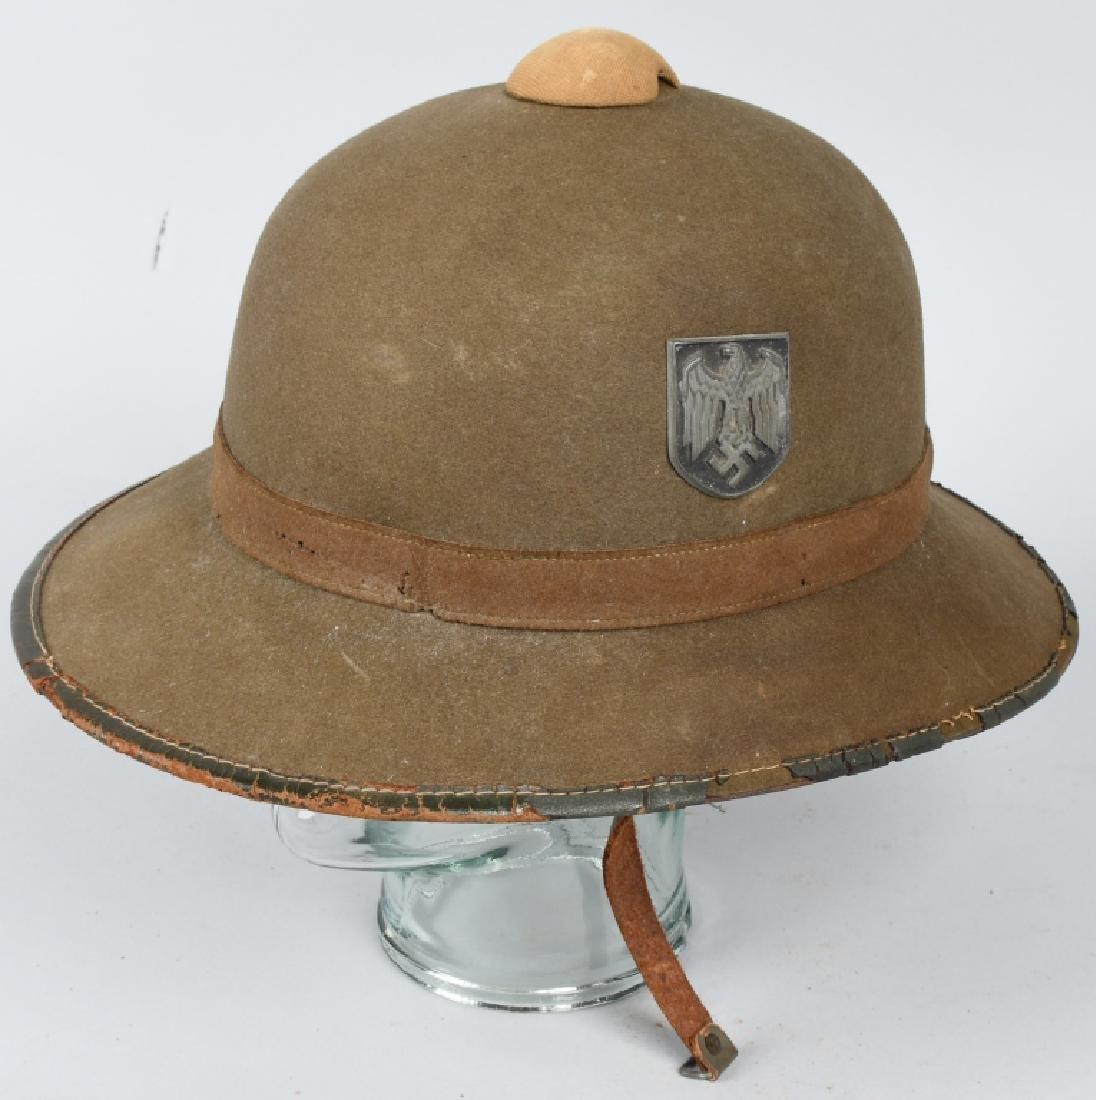 GERMAN NAZI WWII ARMY AFRIKA KORPS SUN PITH HELMET